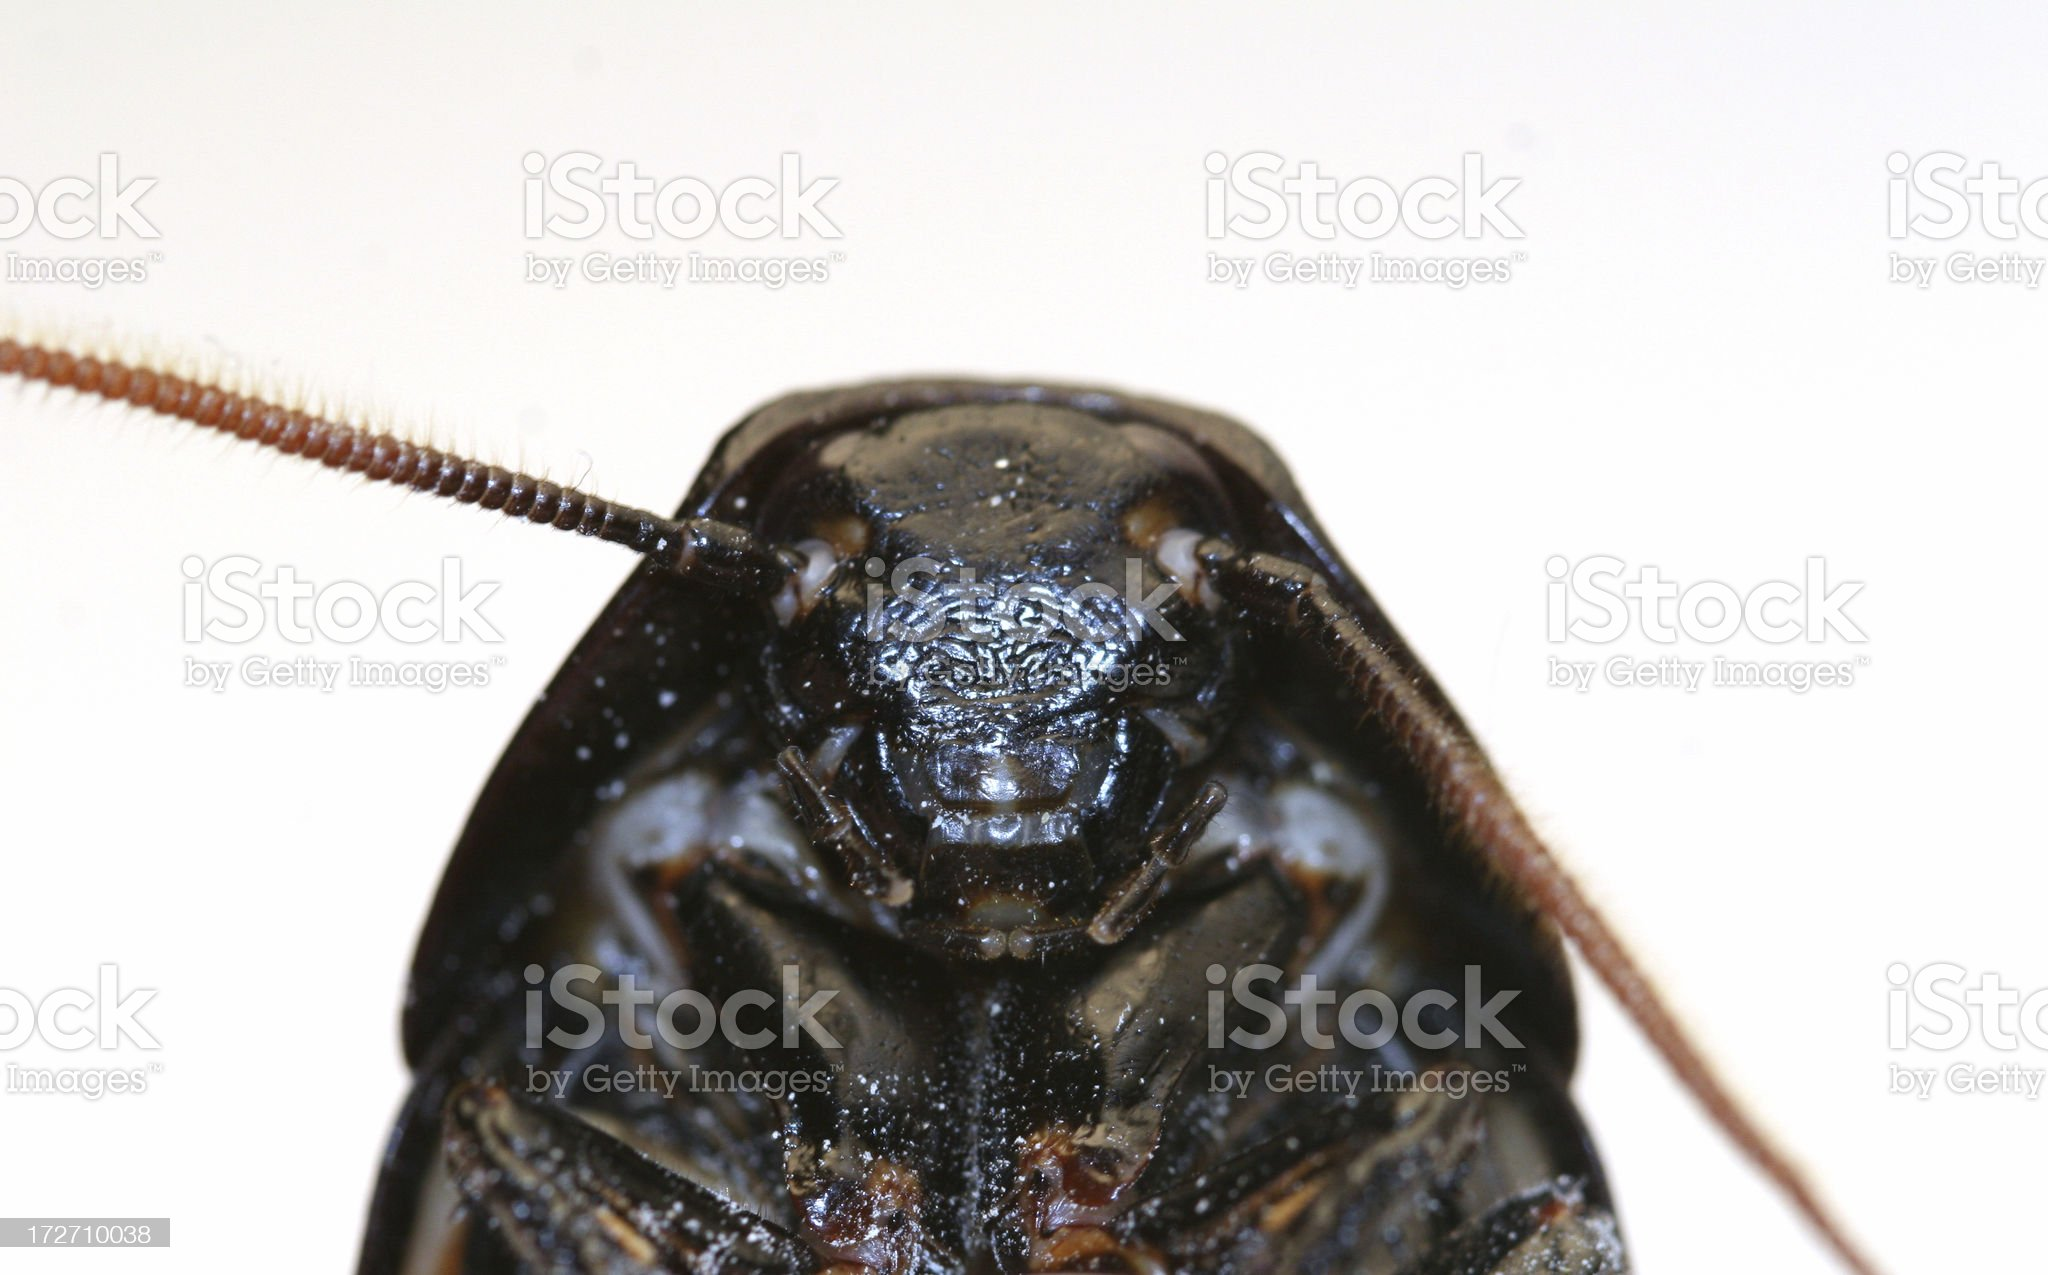 Hissing Roach Faceshot royalty-free stock photo